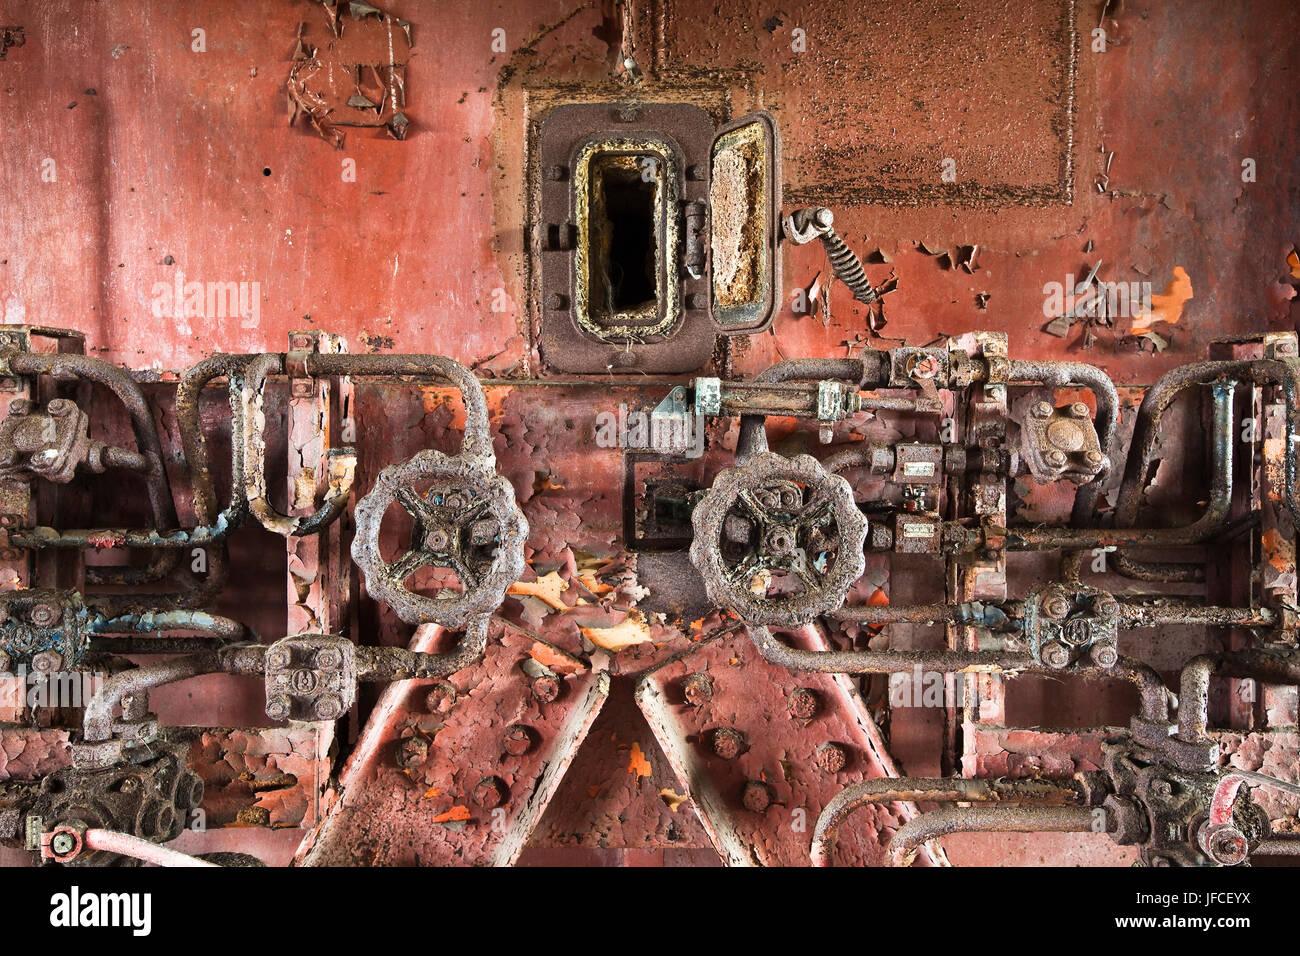 Abandoned industrial site near Venice, Italy. Stock Photo